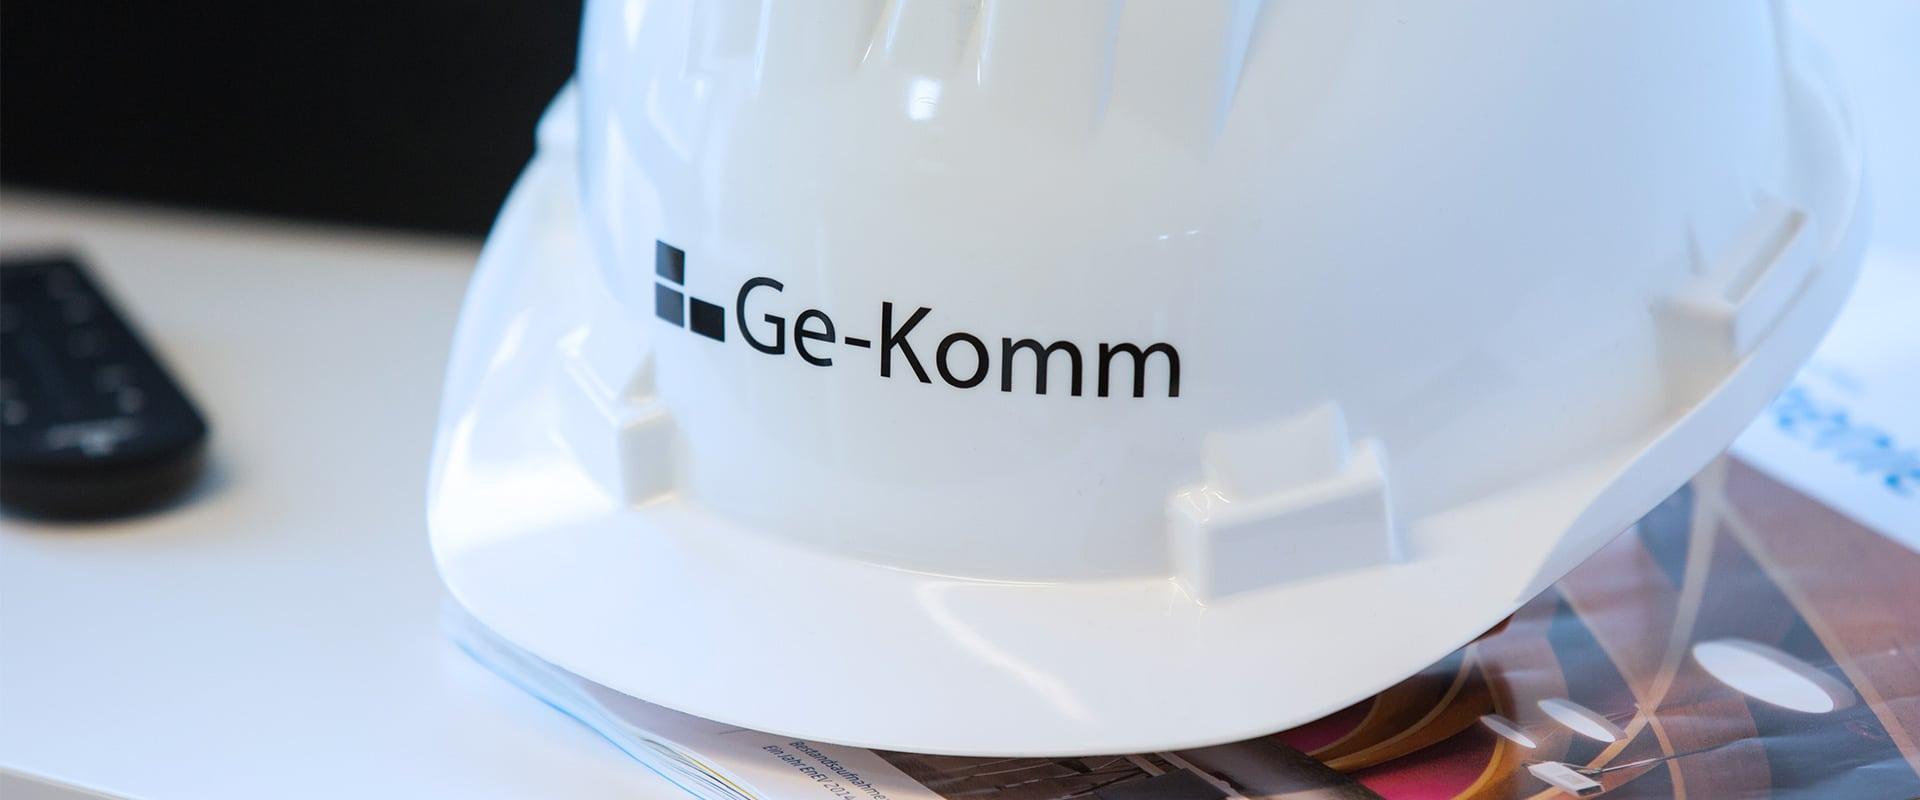 Ge-Komm-GmbH-Bauhelm